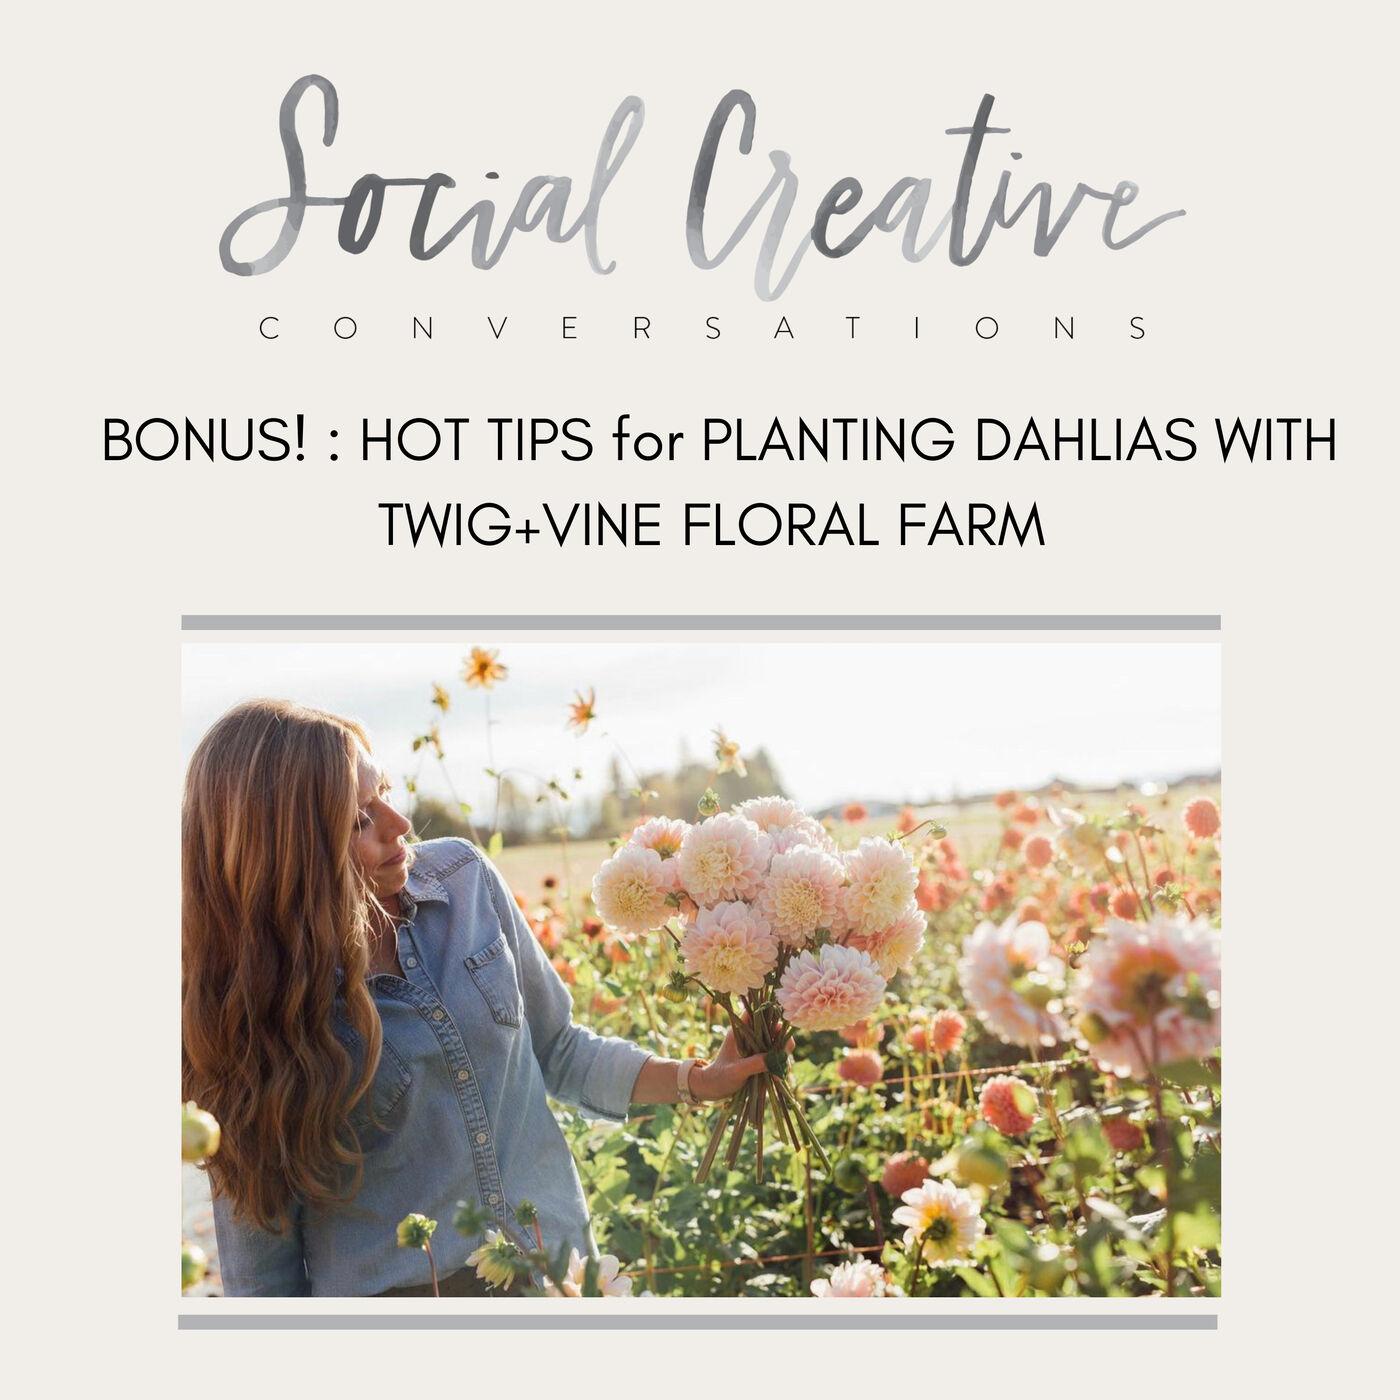 BONUS! HOT TIPS for PLANTING DAHLIAS WITH TWIG + VINE FLORAL FARM